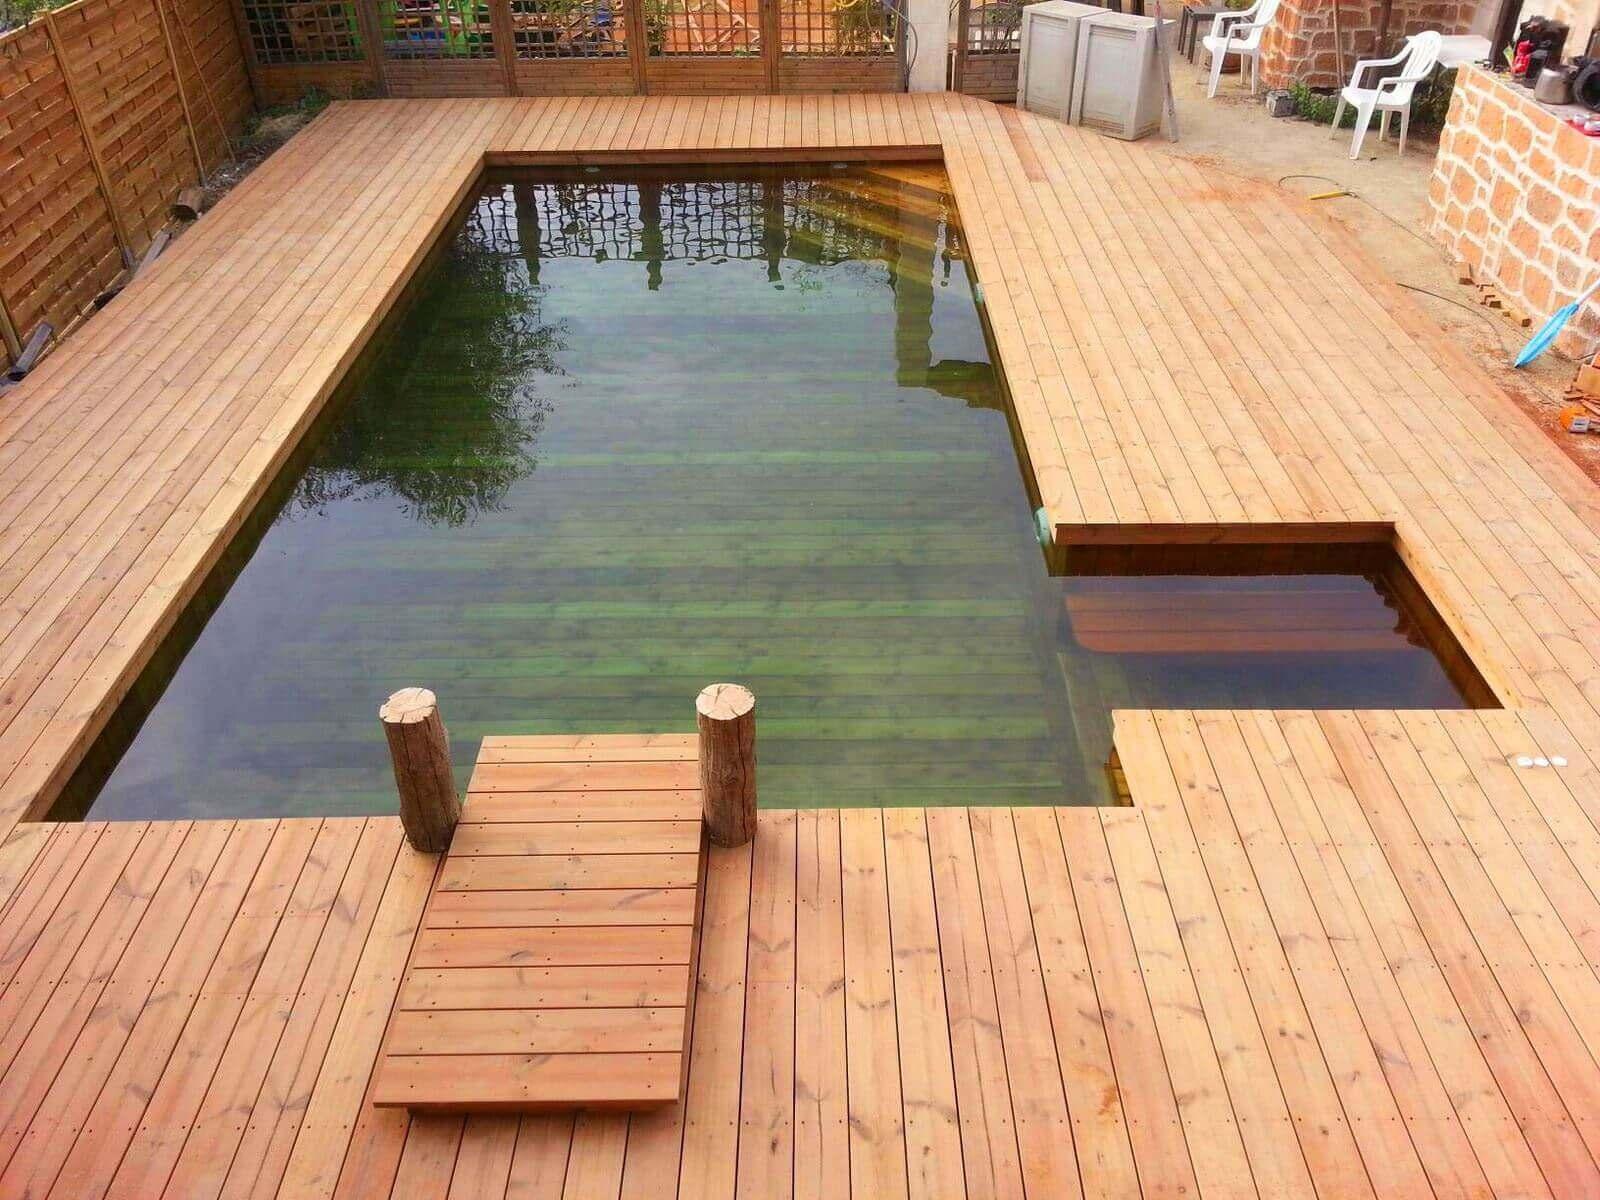 piscine bois avec jacuzzi integre a nice superbe realisation dune piscine avec terrasse sur la totalite dun jardin la piscine integre un espace jacuzzi